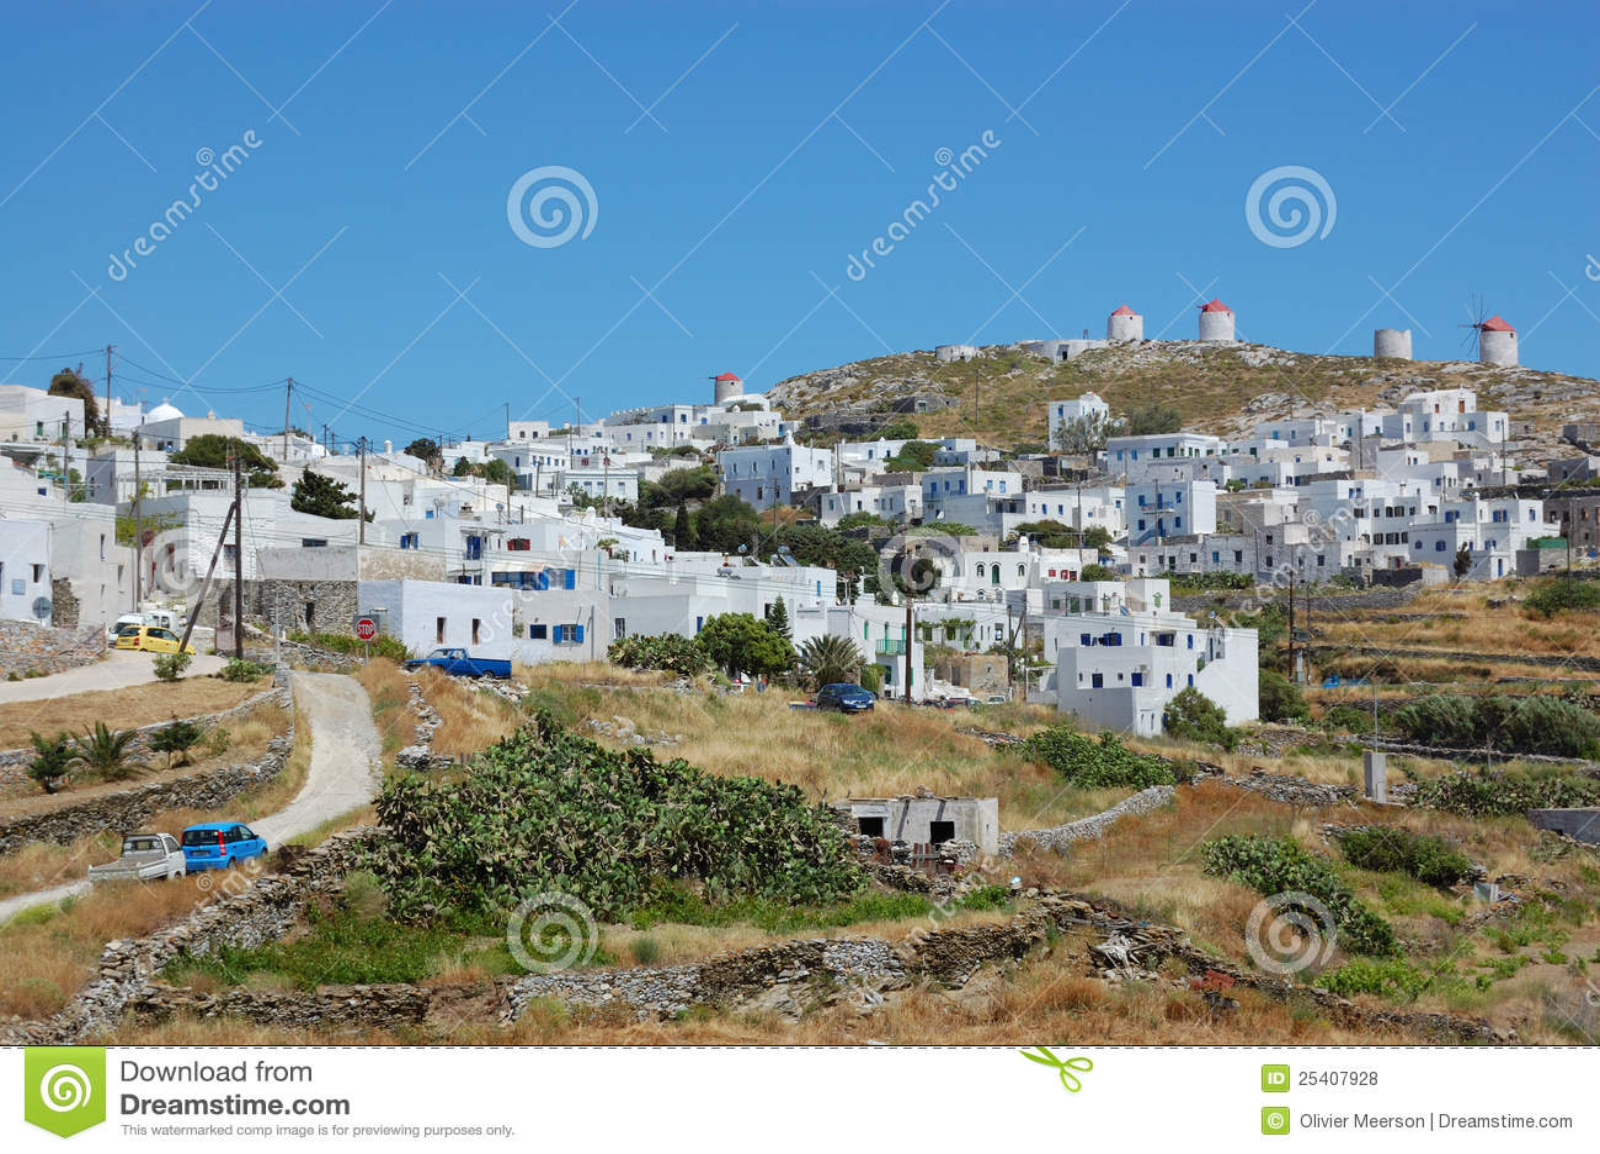 Greek village, amorgos